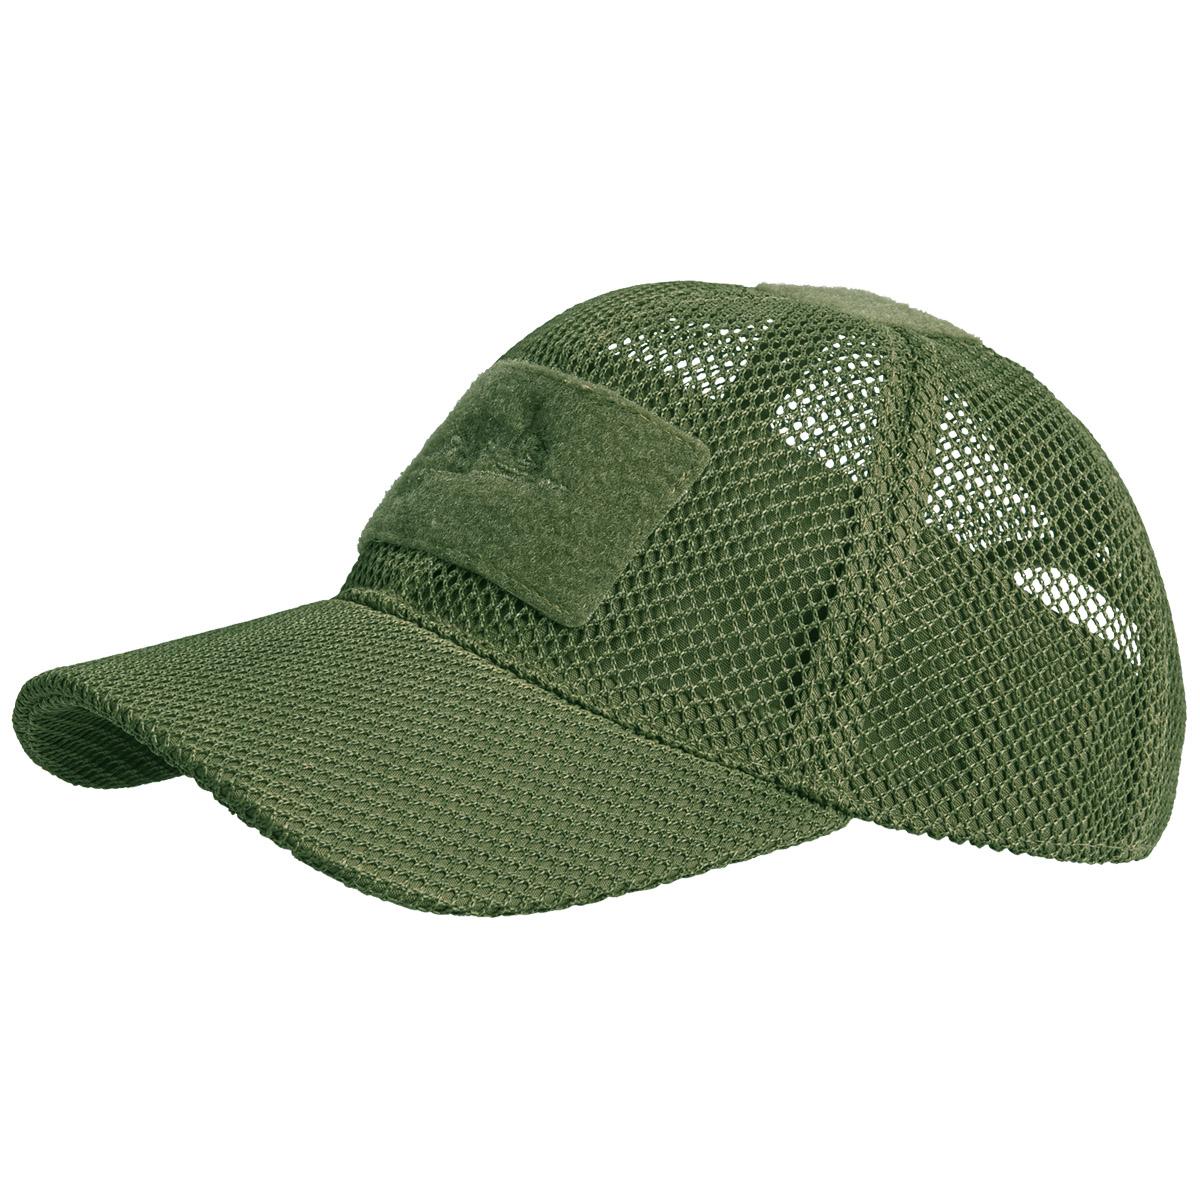 helikon tactical mesh baseball cap breathable hat airsoft